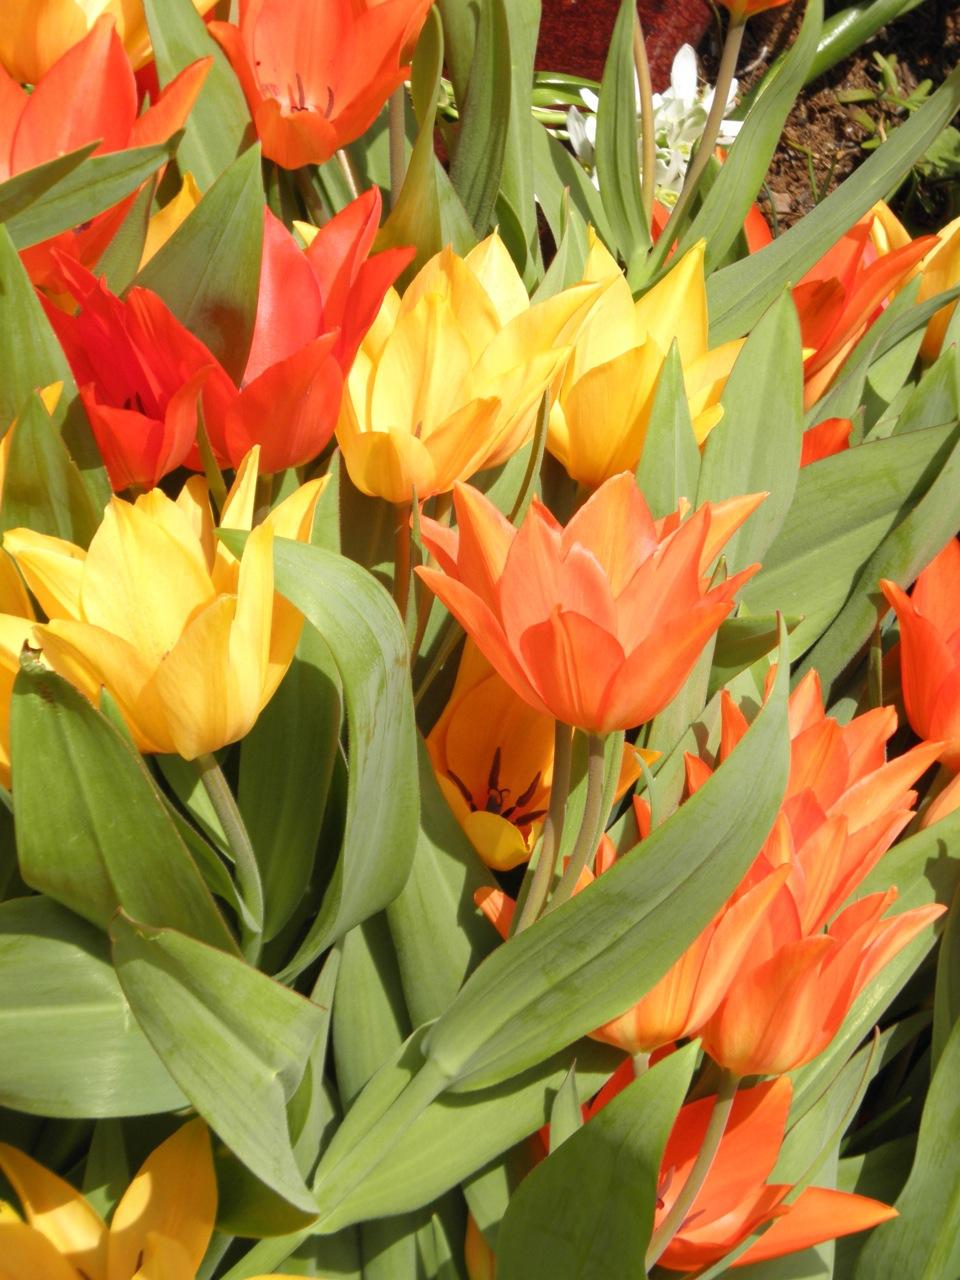 tulipa-pratense-shogun-flowers.jpg